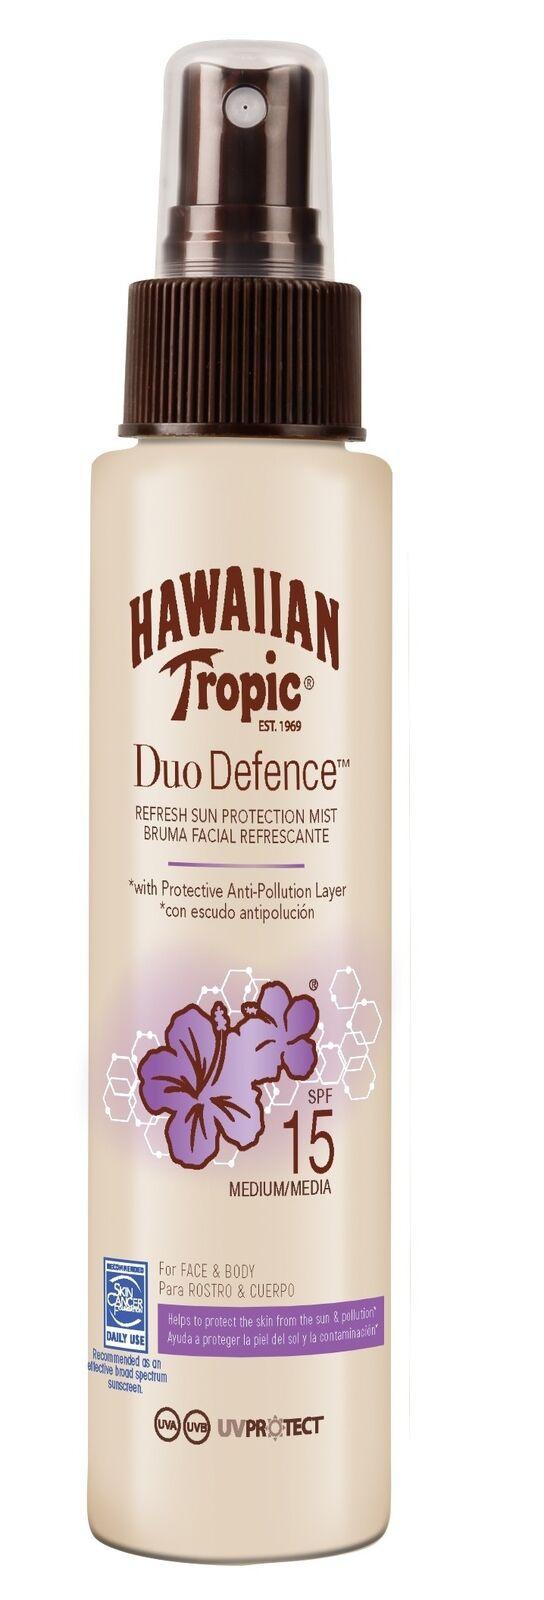 Hawaiian Tropic Duo Defense Refresh Mist SPF 15